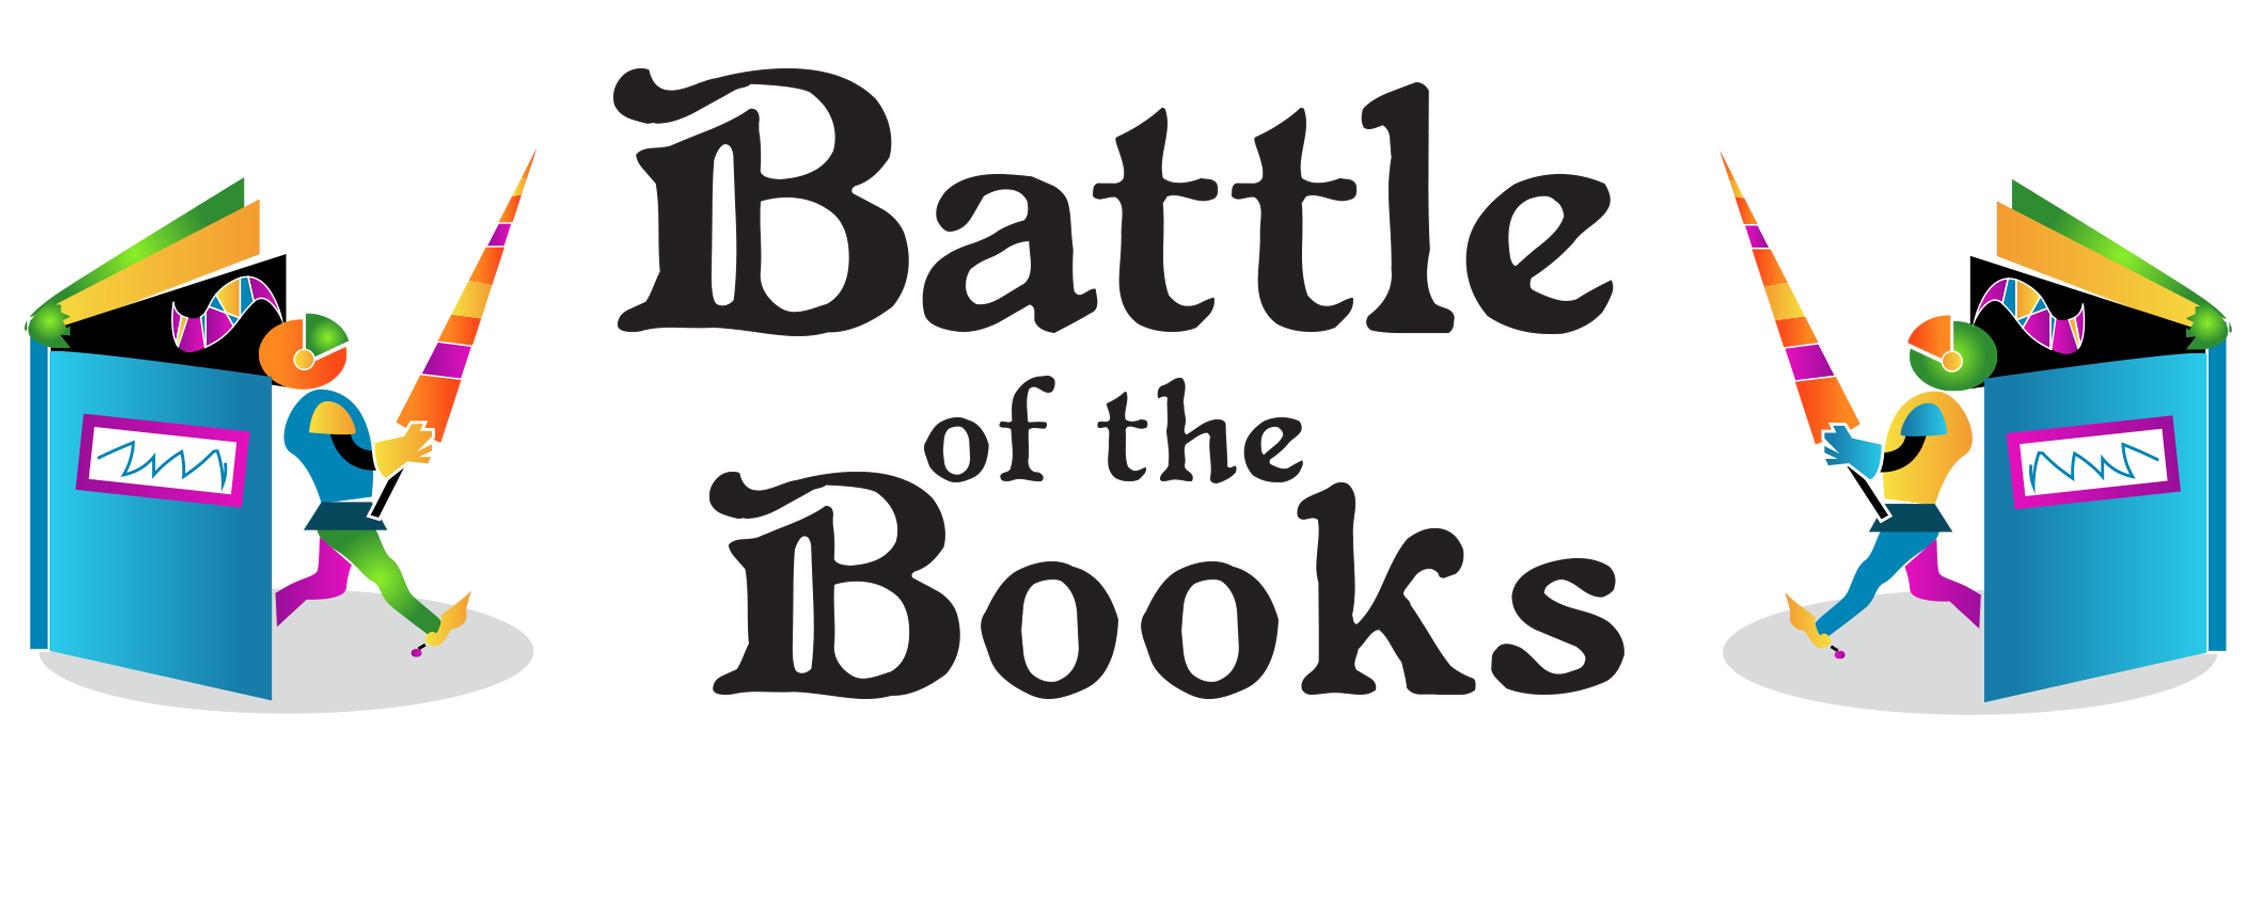 Of the books bull. Battle clipart book